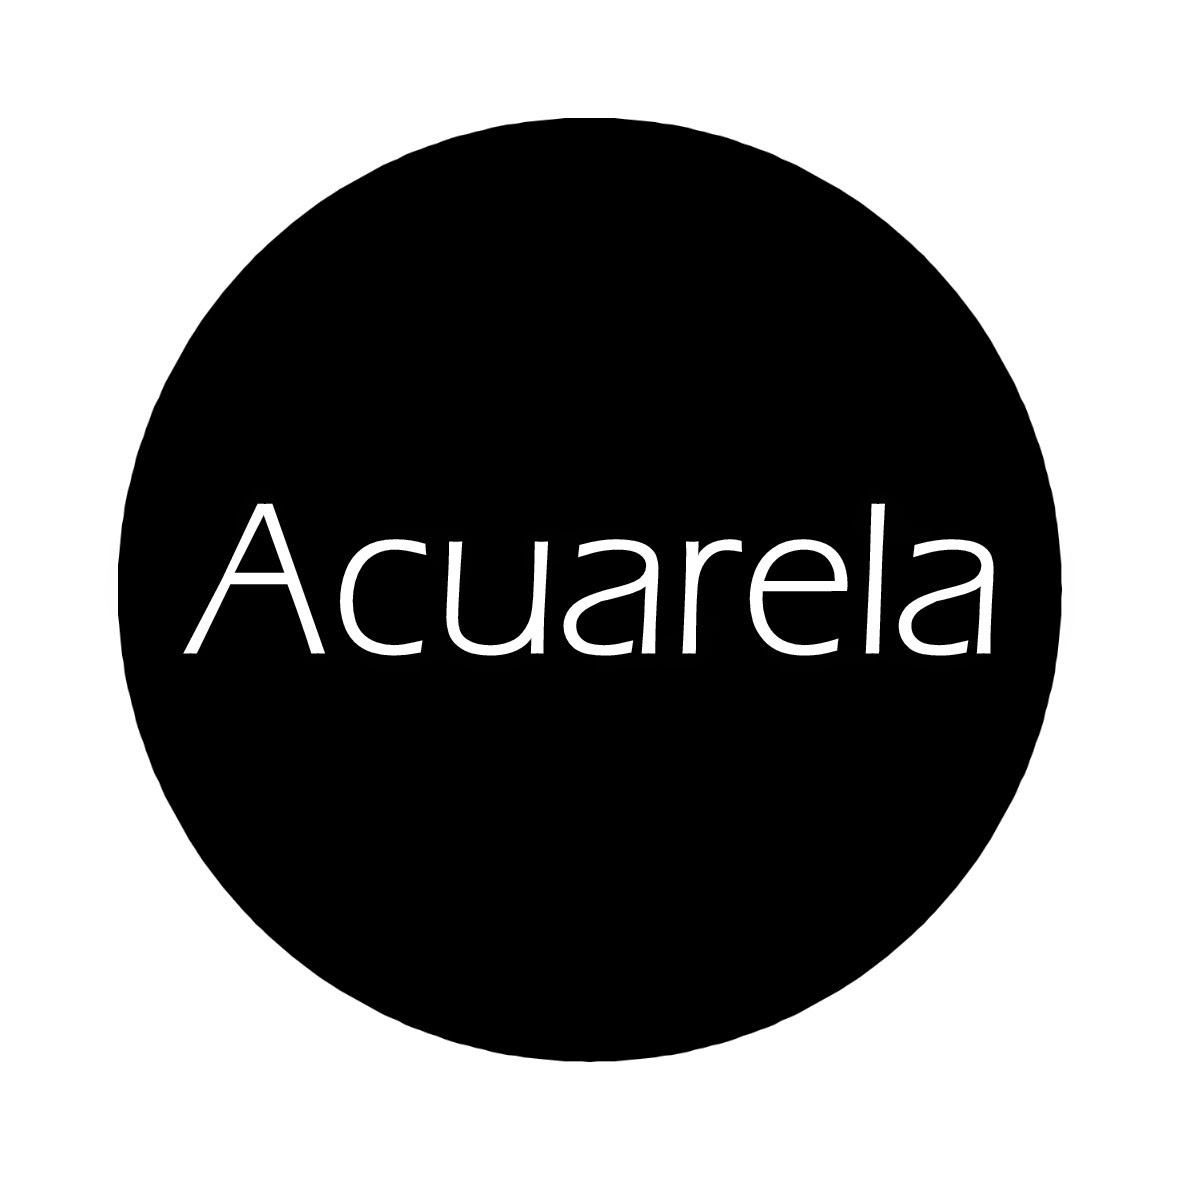 http://javierlopezromero.blogspot.com.es/p/acuarela.html